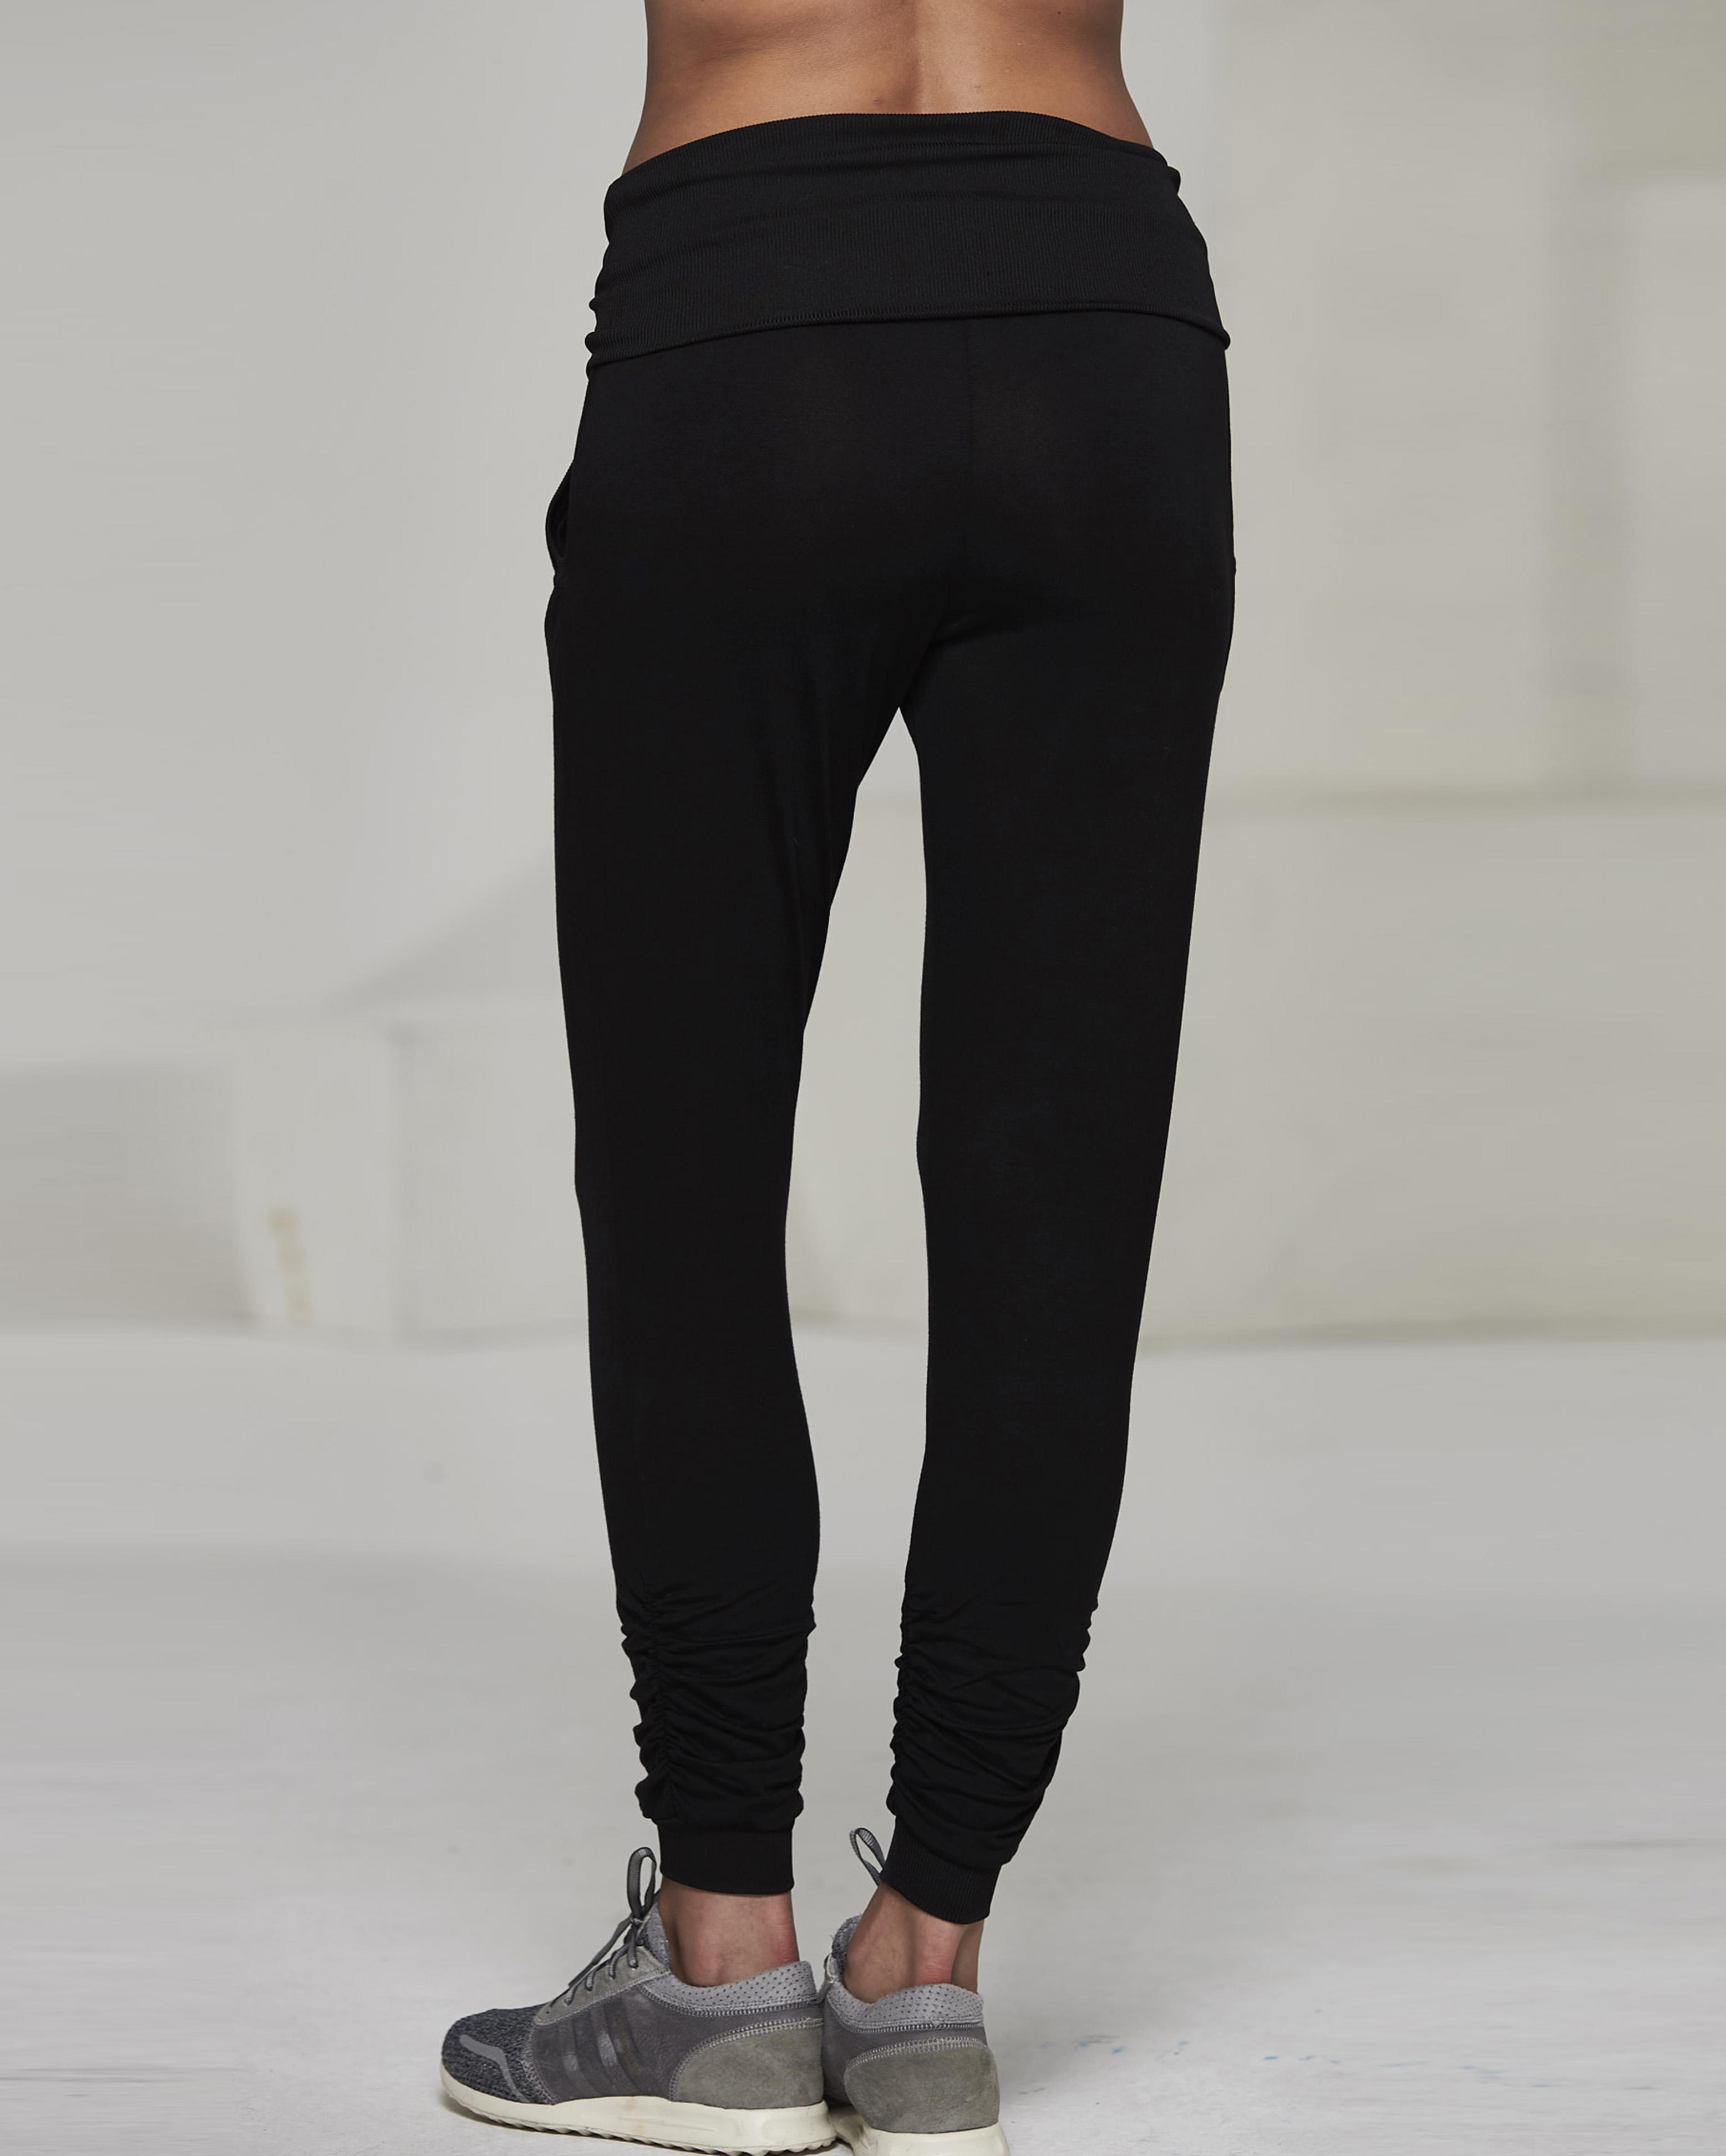 Ellesport Drape Roll Waist Slouch Pant – Black